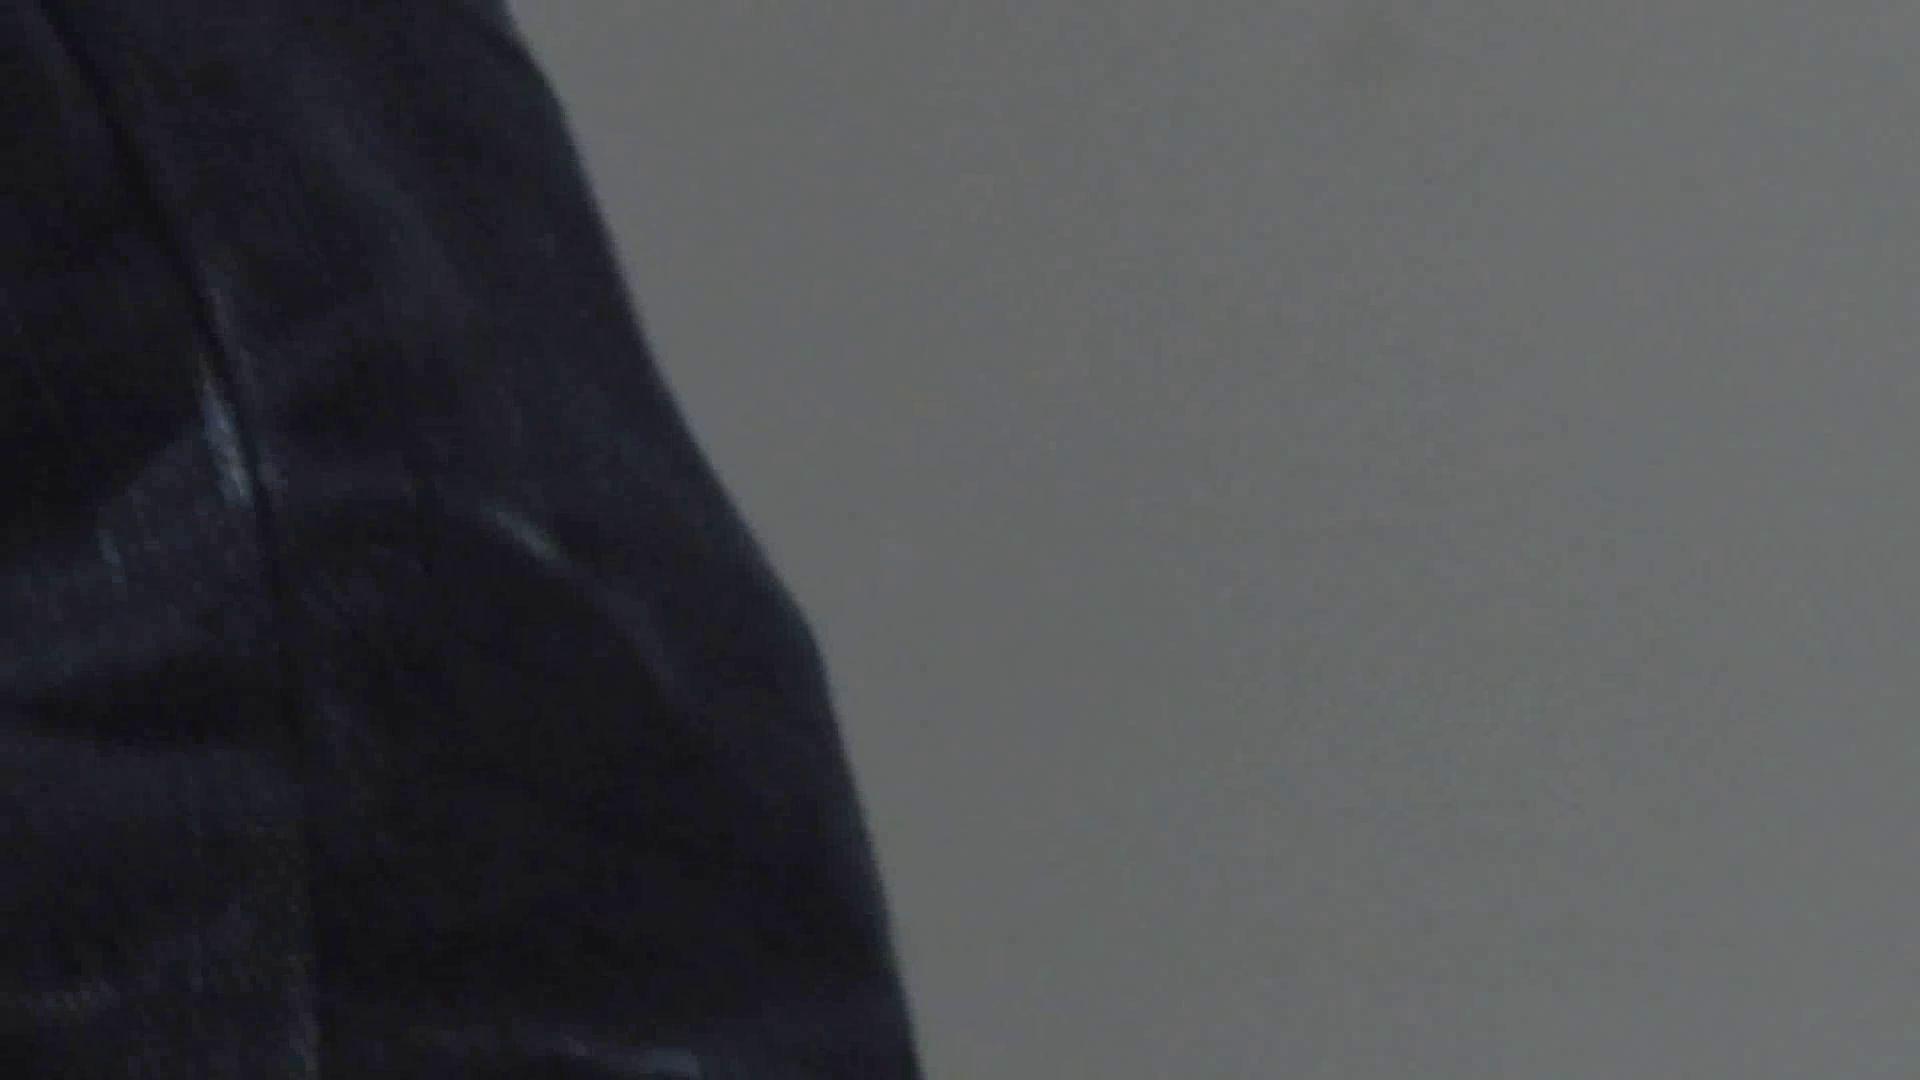 vol.24 命がけ潜伏洗面所! 三十時間潜り、一つしか出会えない完璧桃尻編 洗面所   美女OL  33連発 7